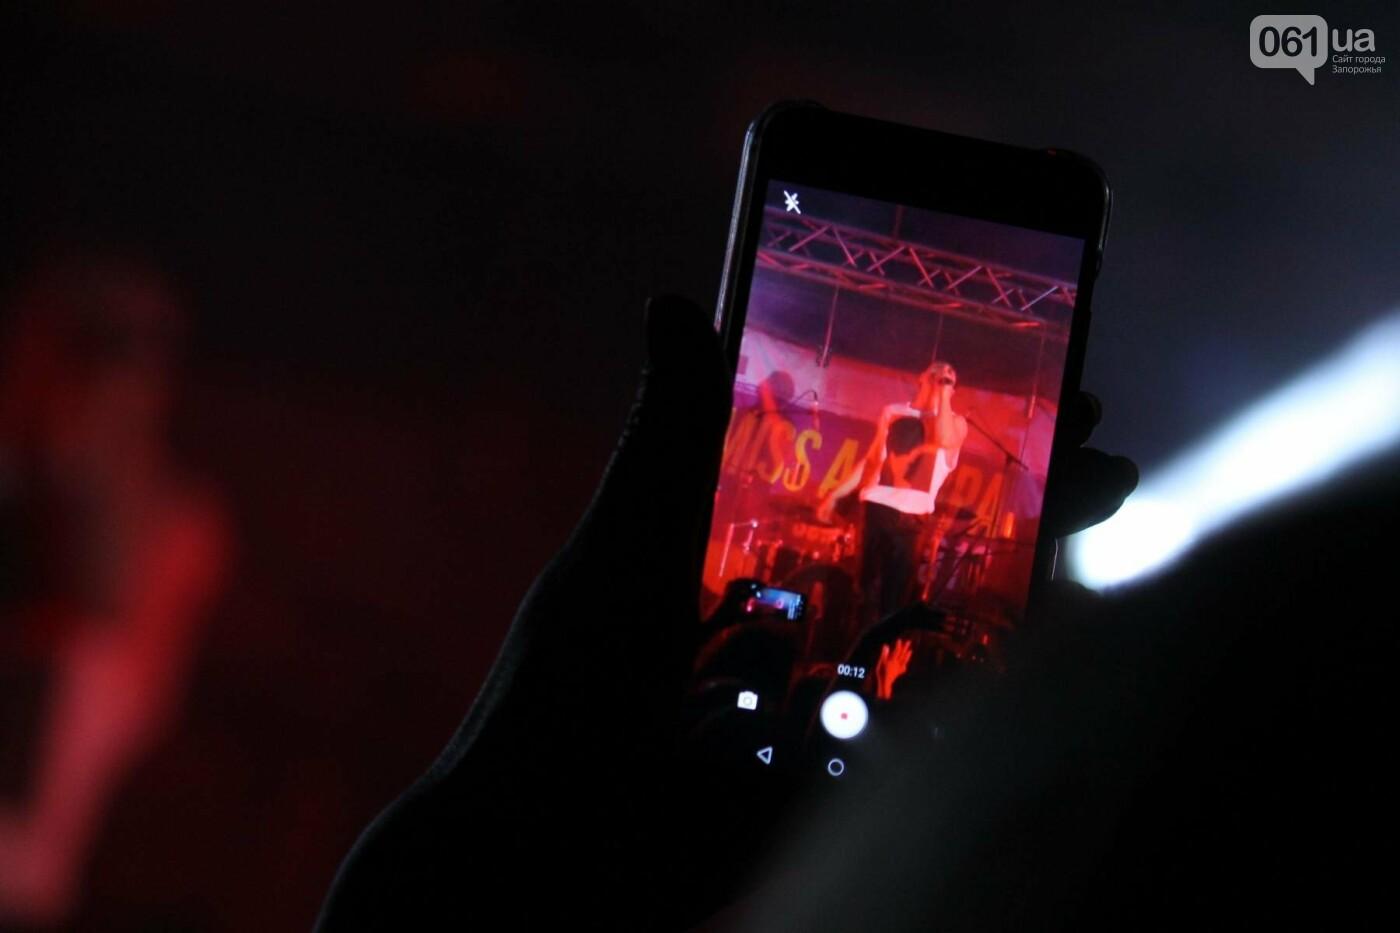 ALEKSEEV, «Агонь» и MamaRika: в Запорожье звезды устроили яркий концерт на «Miss AVRORA Summer 2018», – ФОТОРЕПОРТАЖ, фото-38